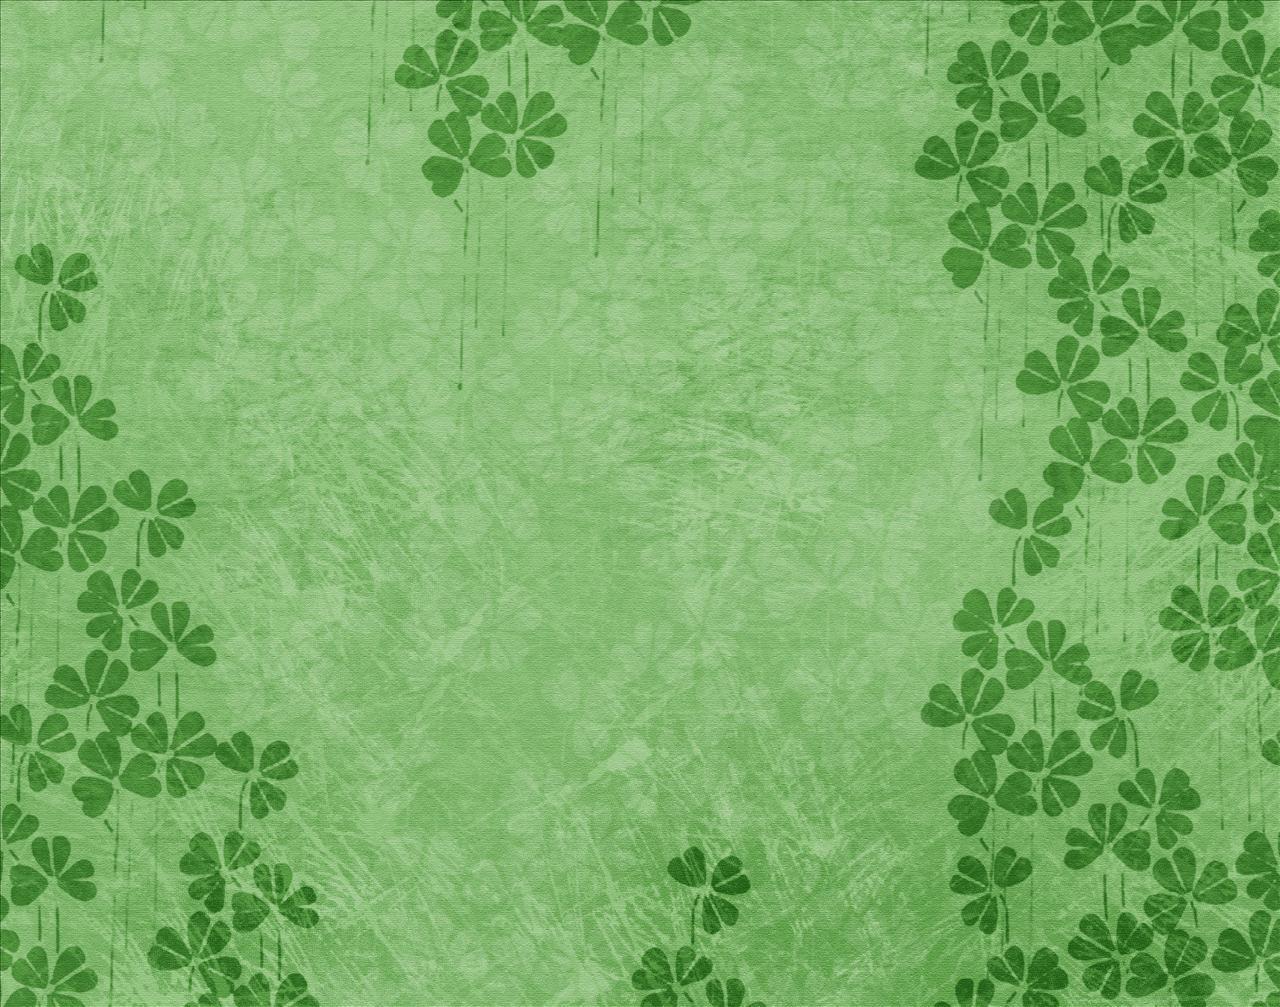 Irish Clover Background Celtic shamroc 1280x1007